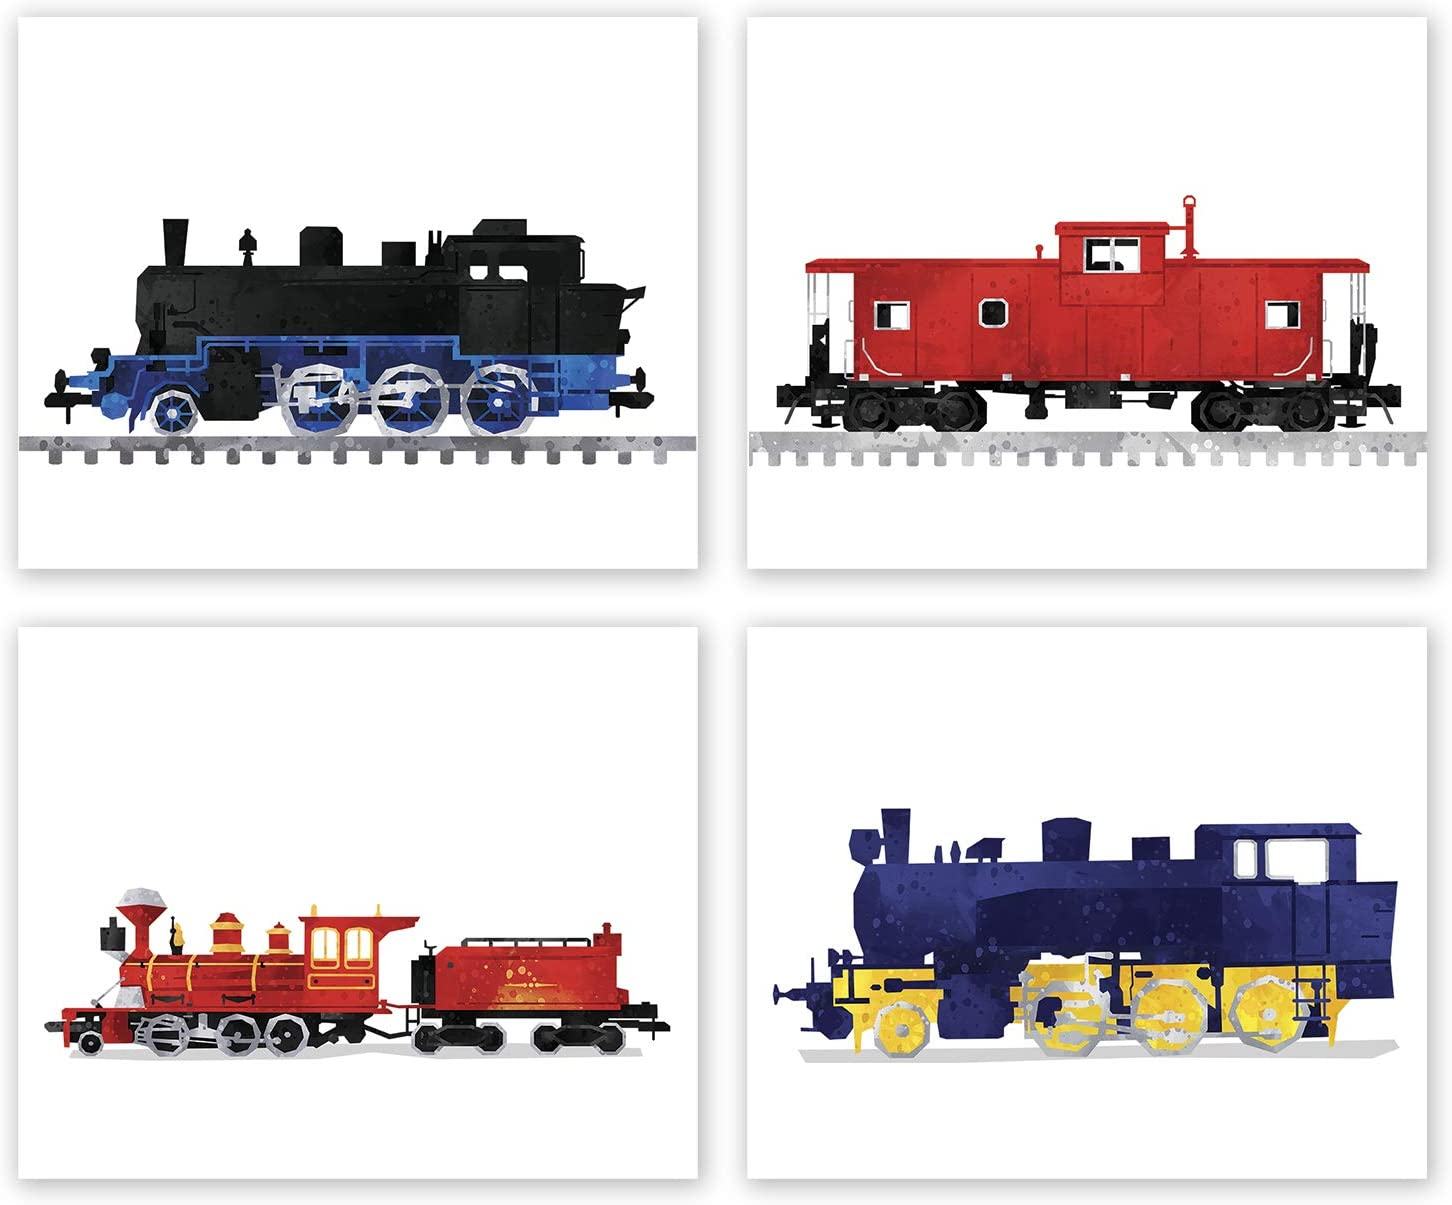 Train Wall Art - Set of 4 Prints // Train Decor // Train Nursery Poster // Birthday Party Decoration // Transportation Art Pictures // Locomotive Steam Engine Prints for Boys Room (8x10, Set 4)